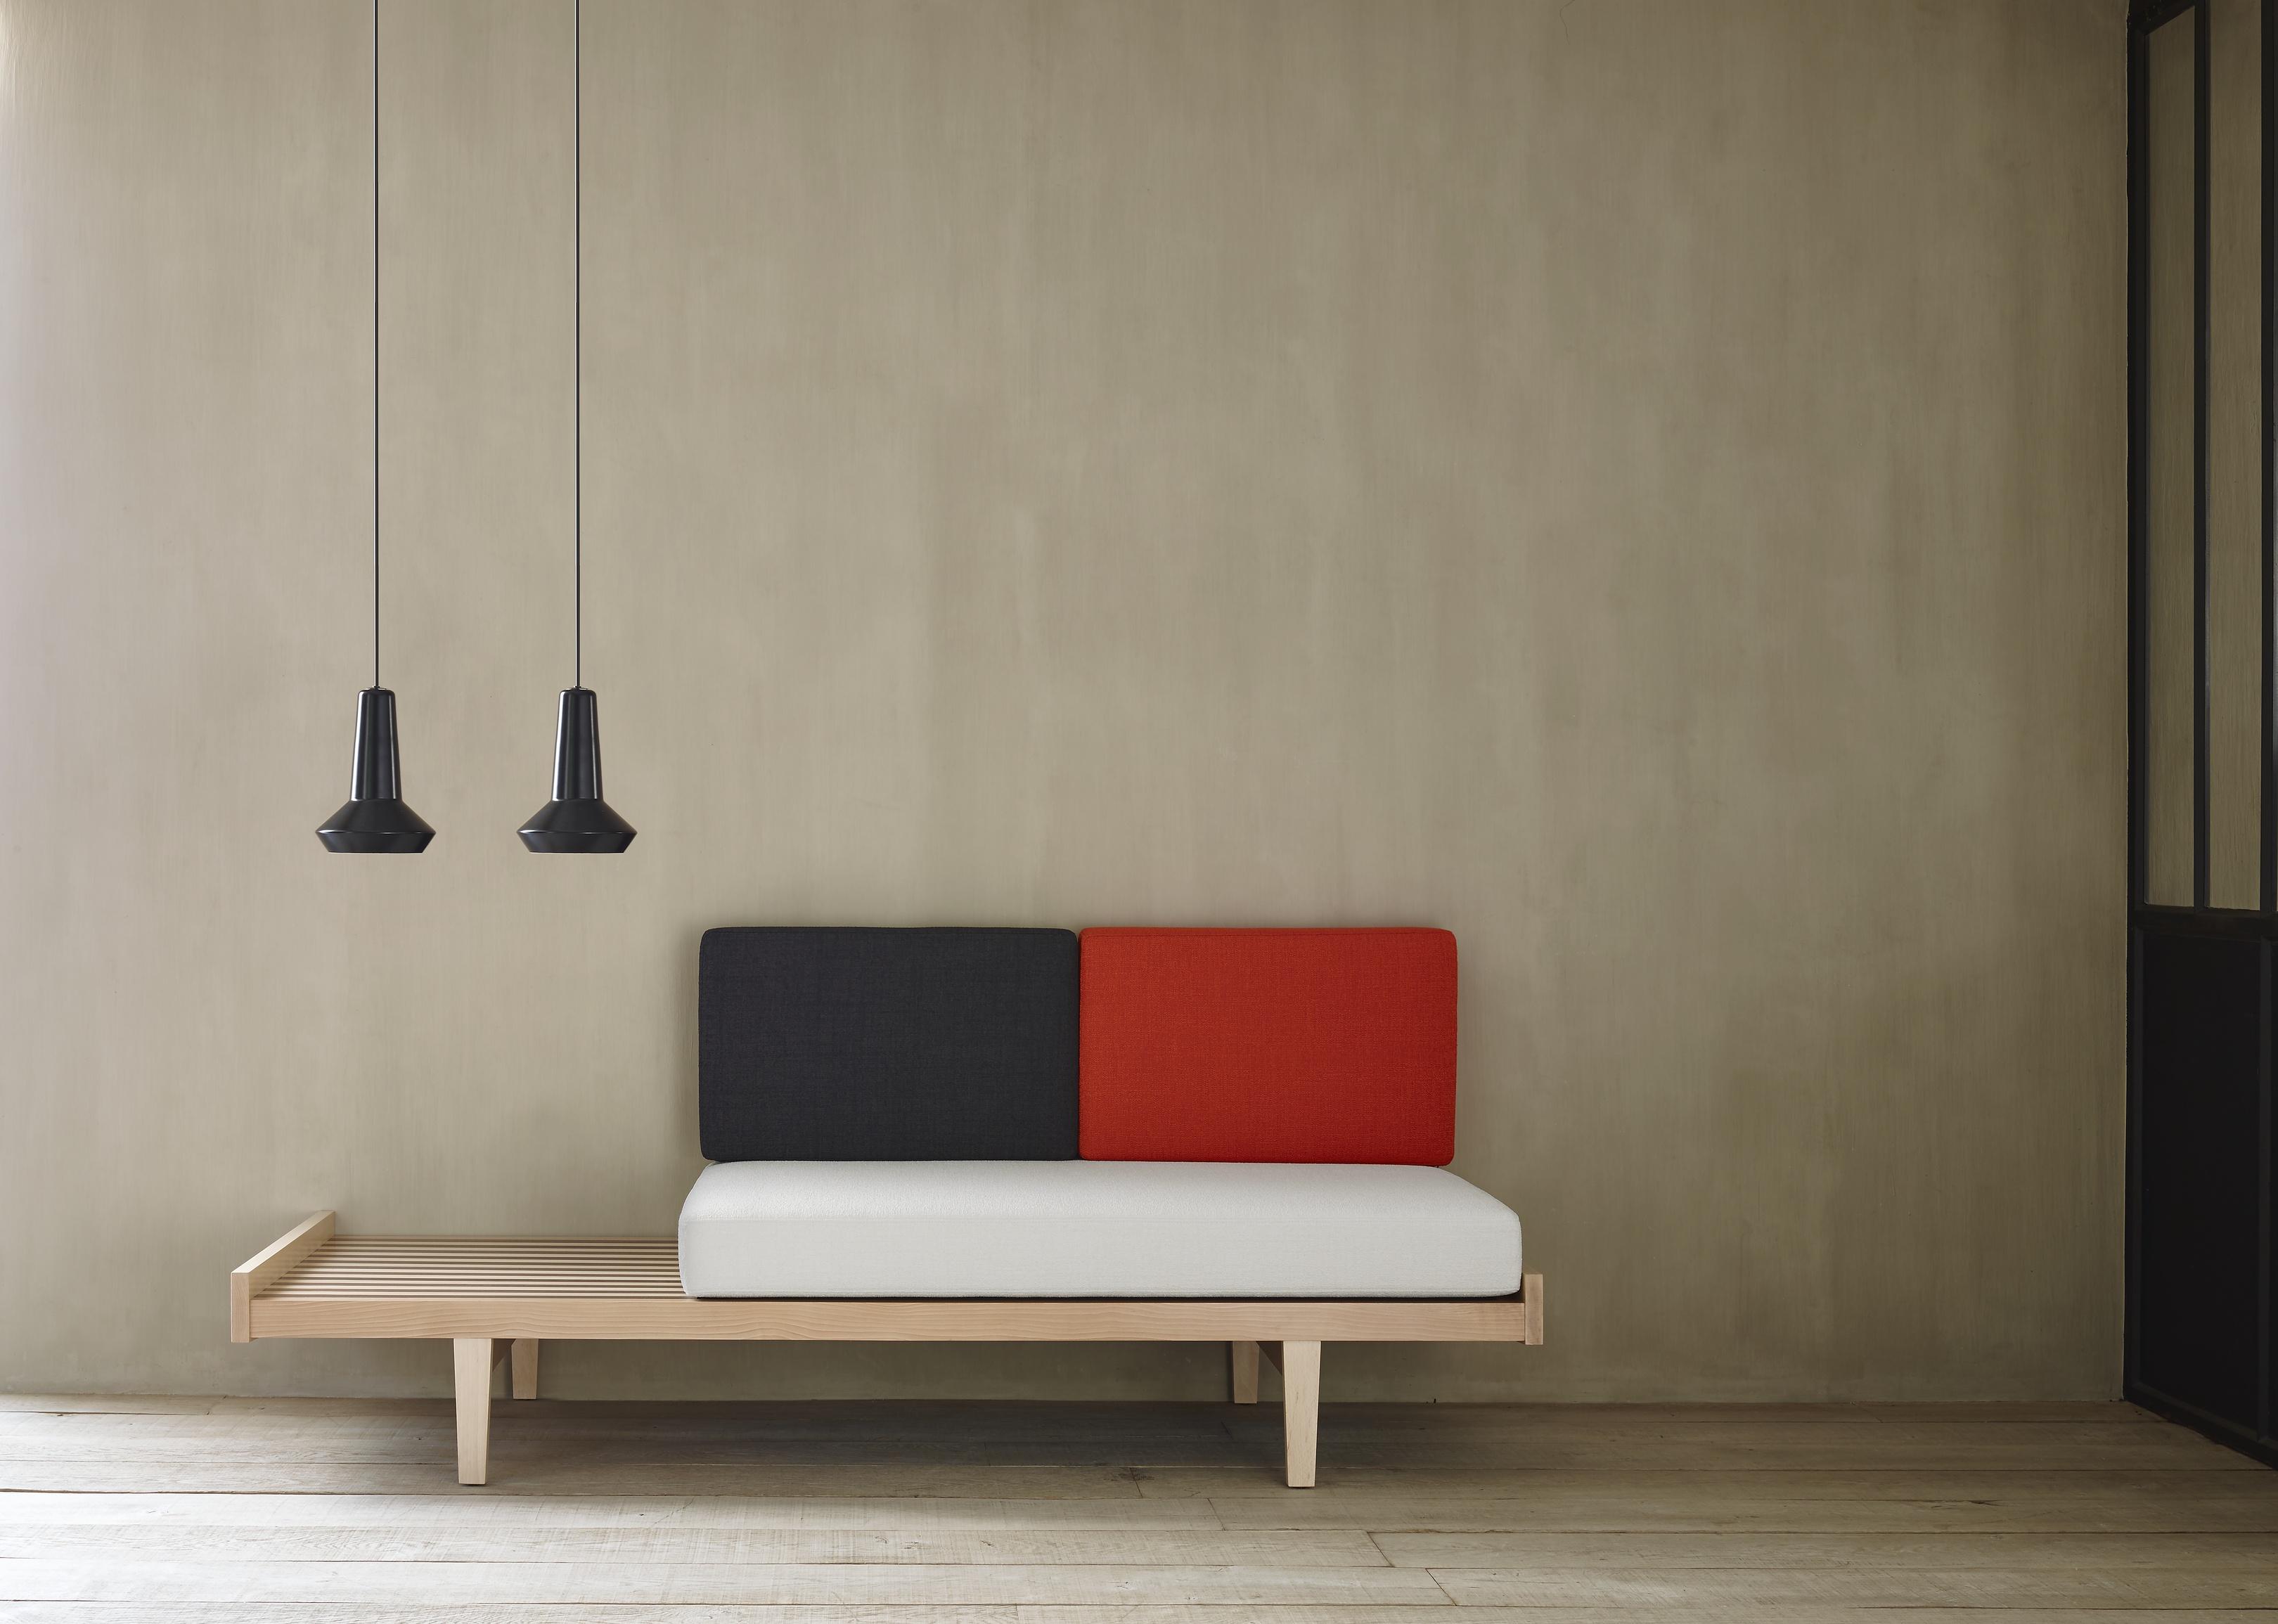 Daybed sofas designer pierre paulin ligne roset for Ligne roset canape